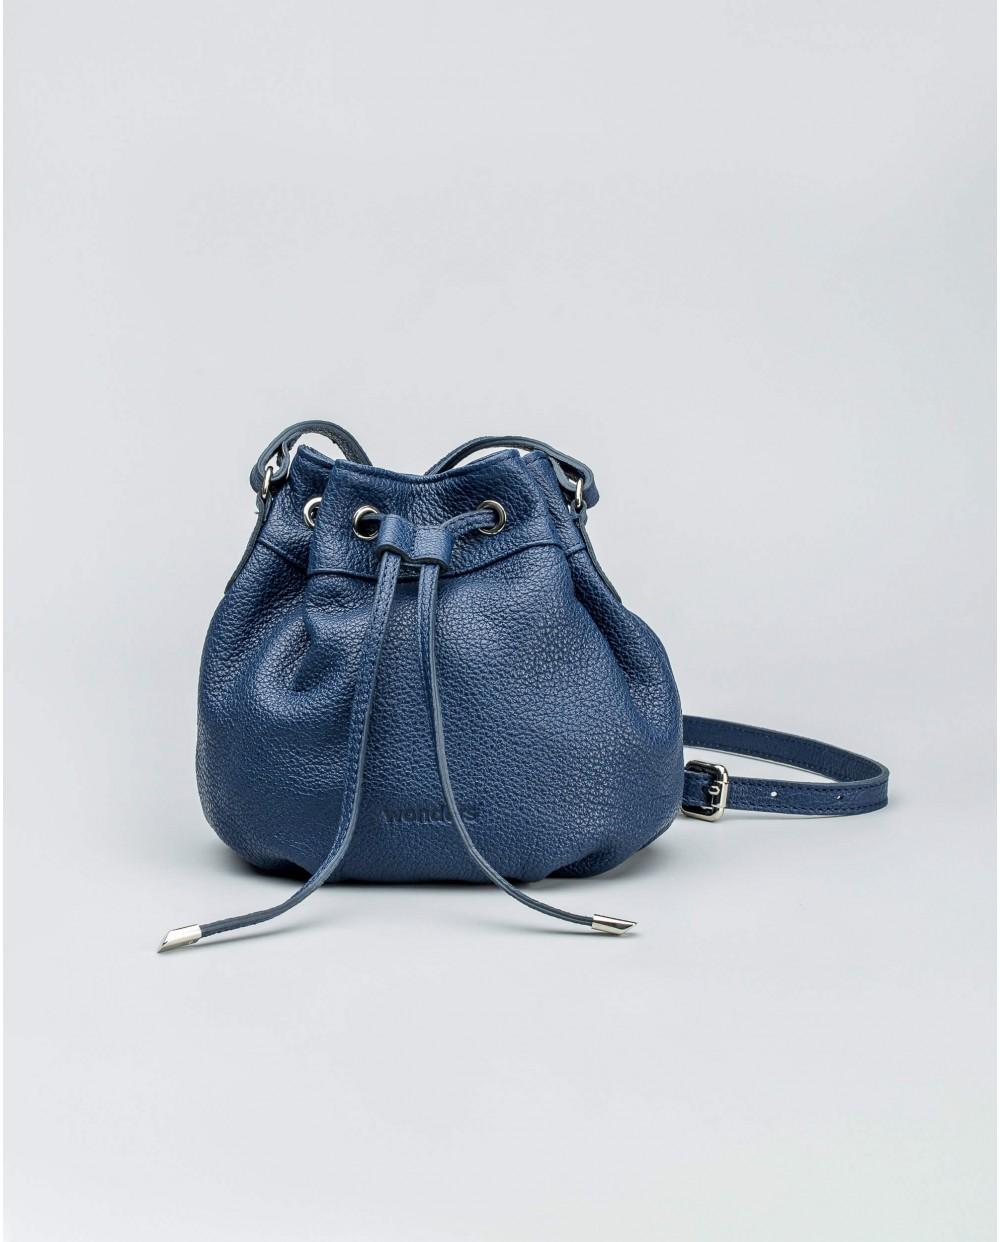 Wonders-Bags-Sack style leather handbag